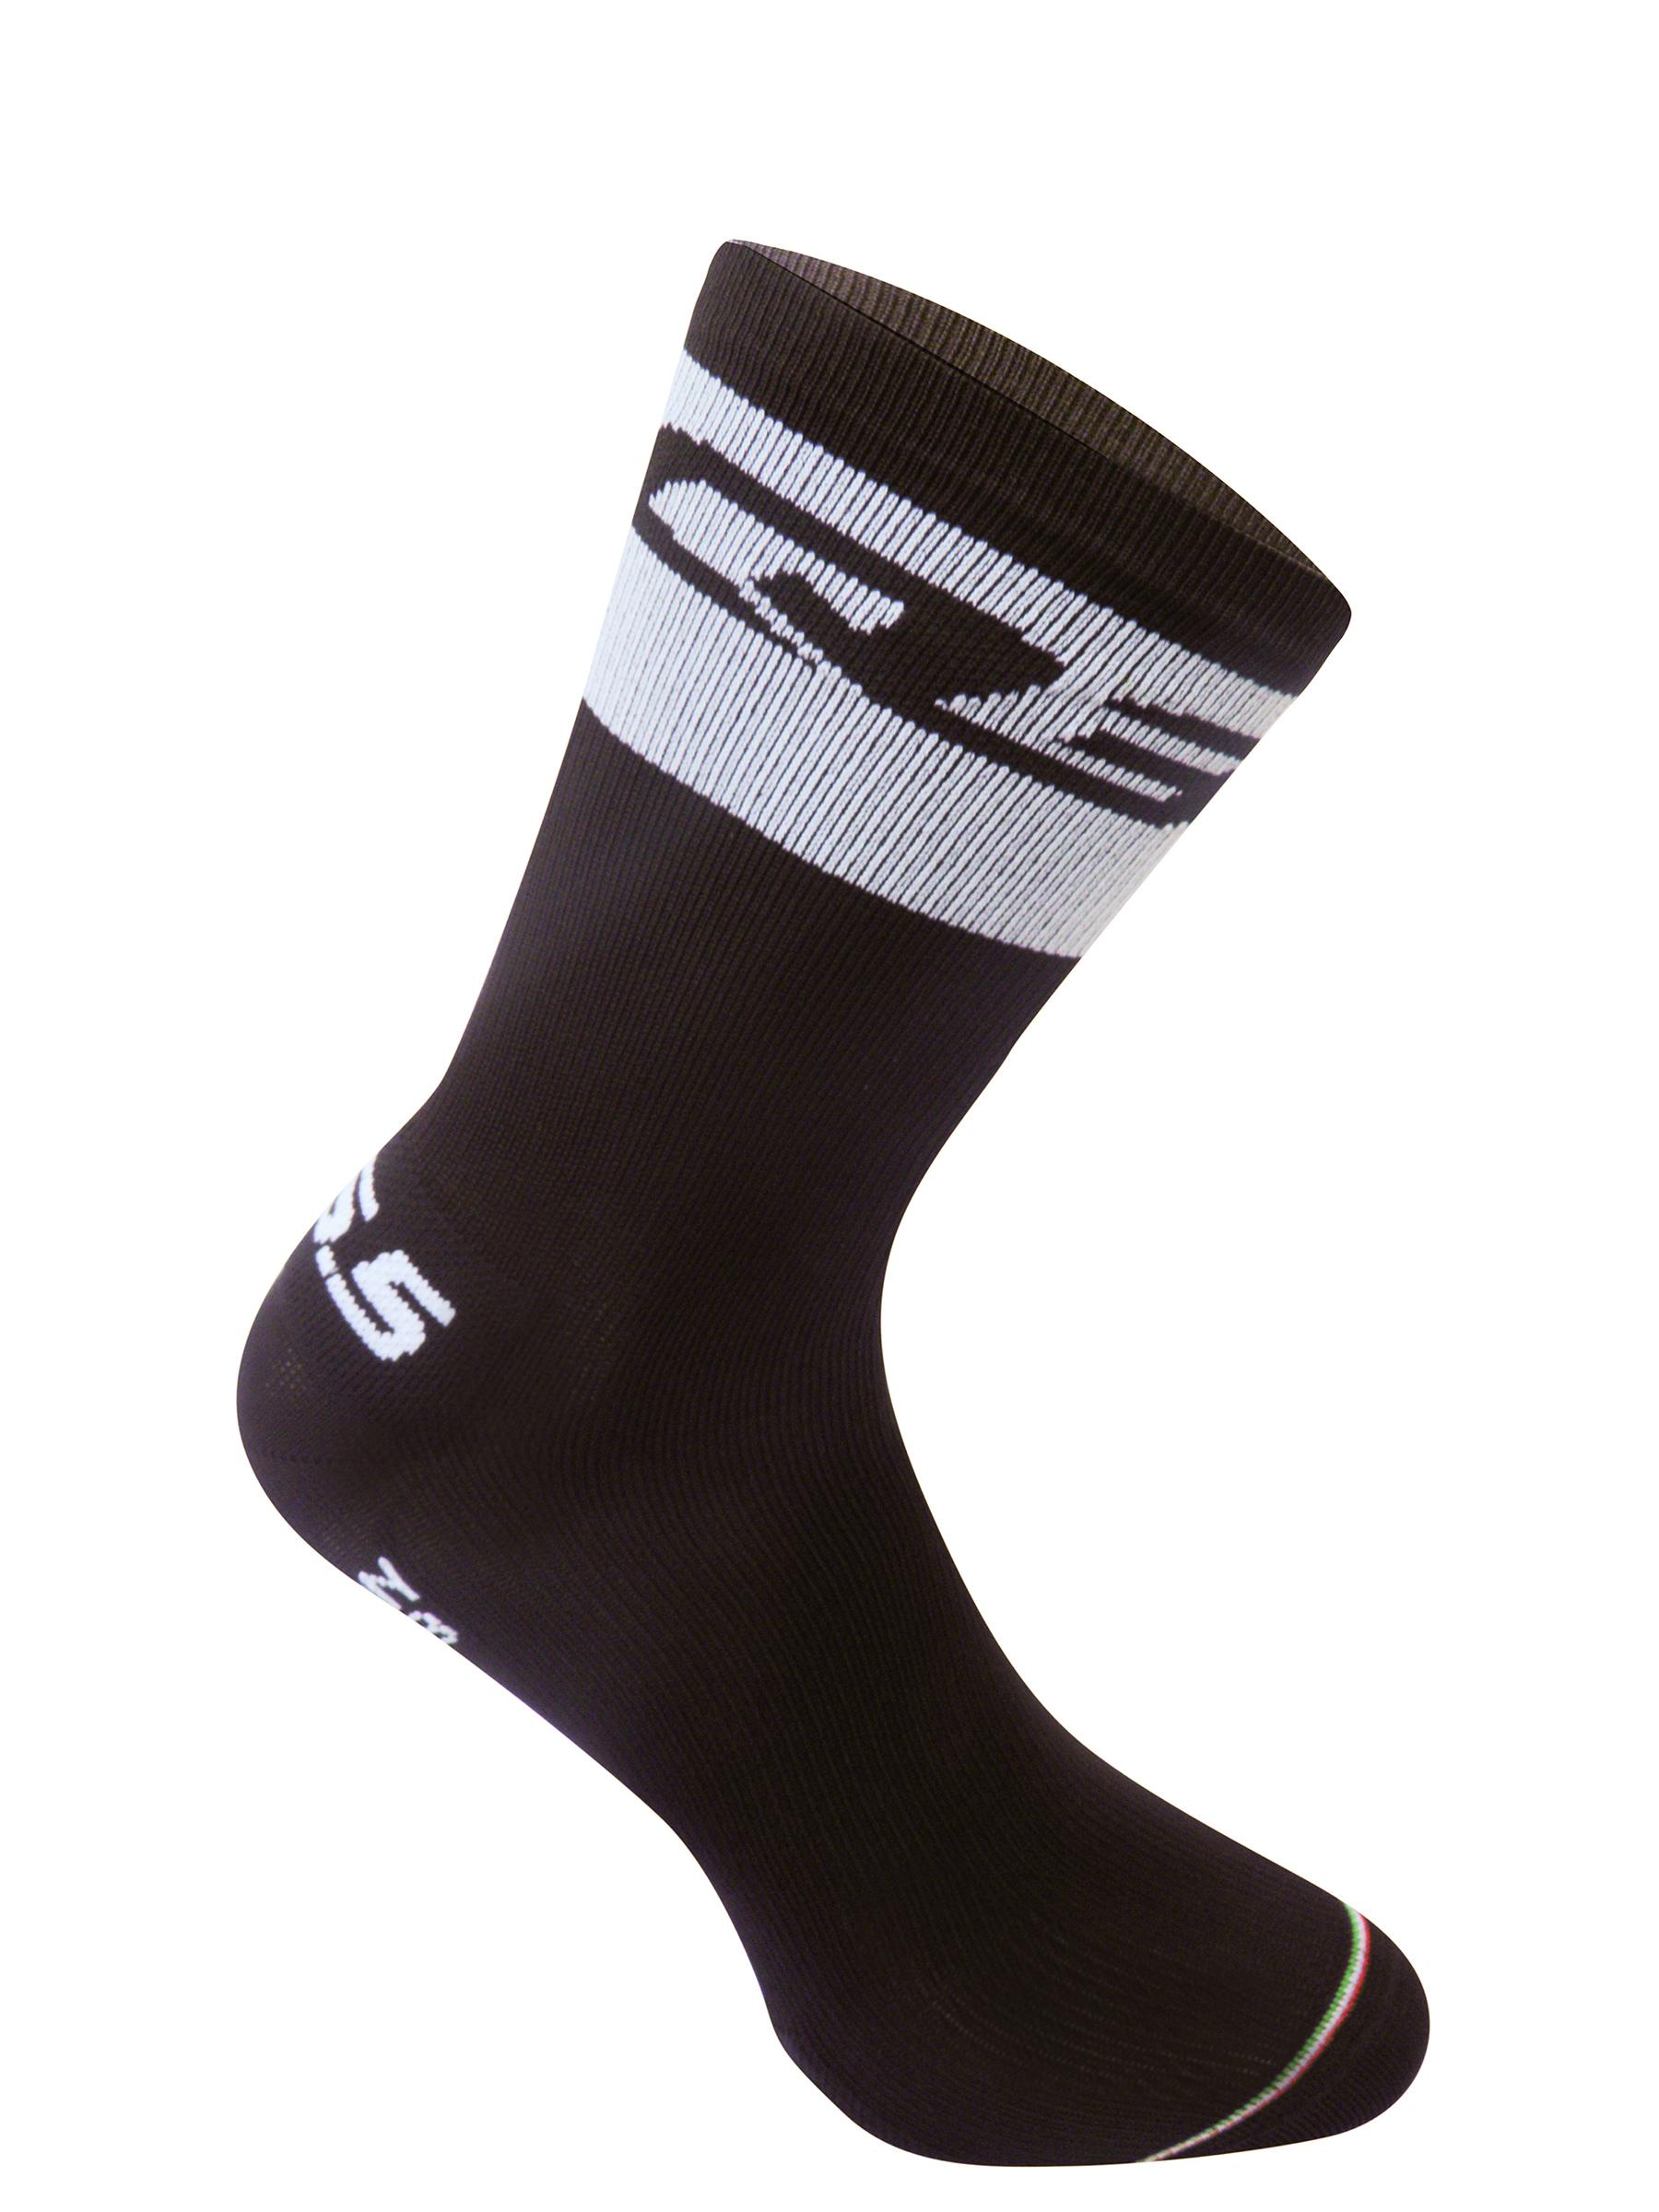 Cycling socks Compression white Band Socks Q36.5